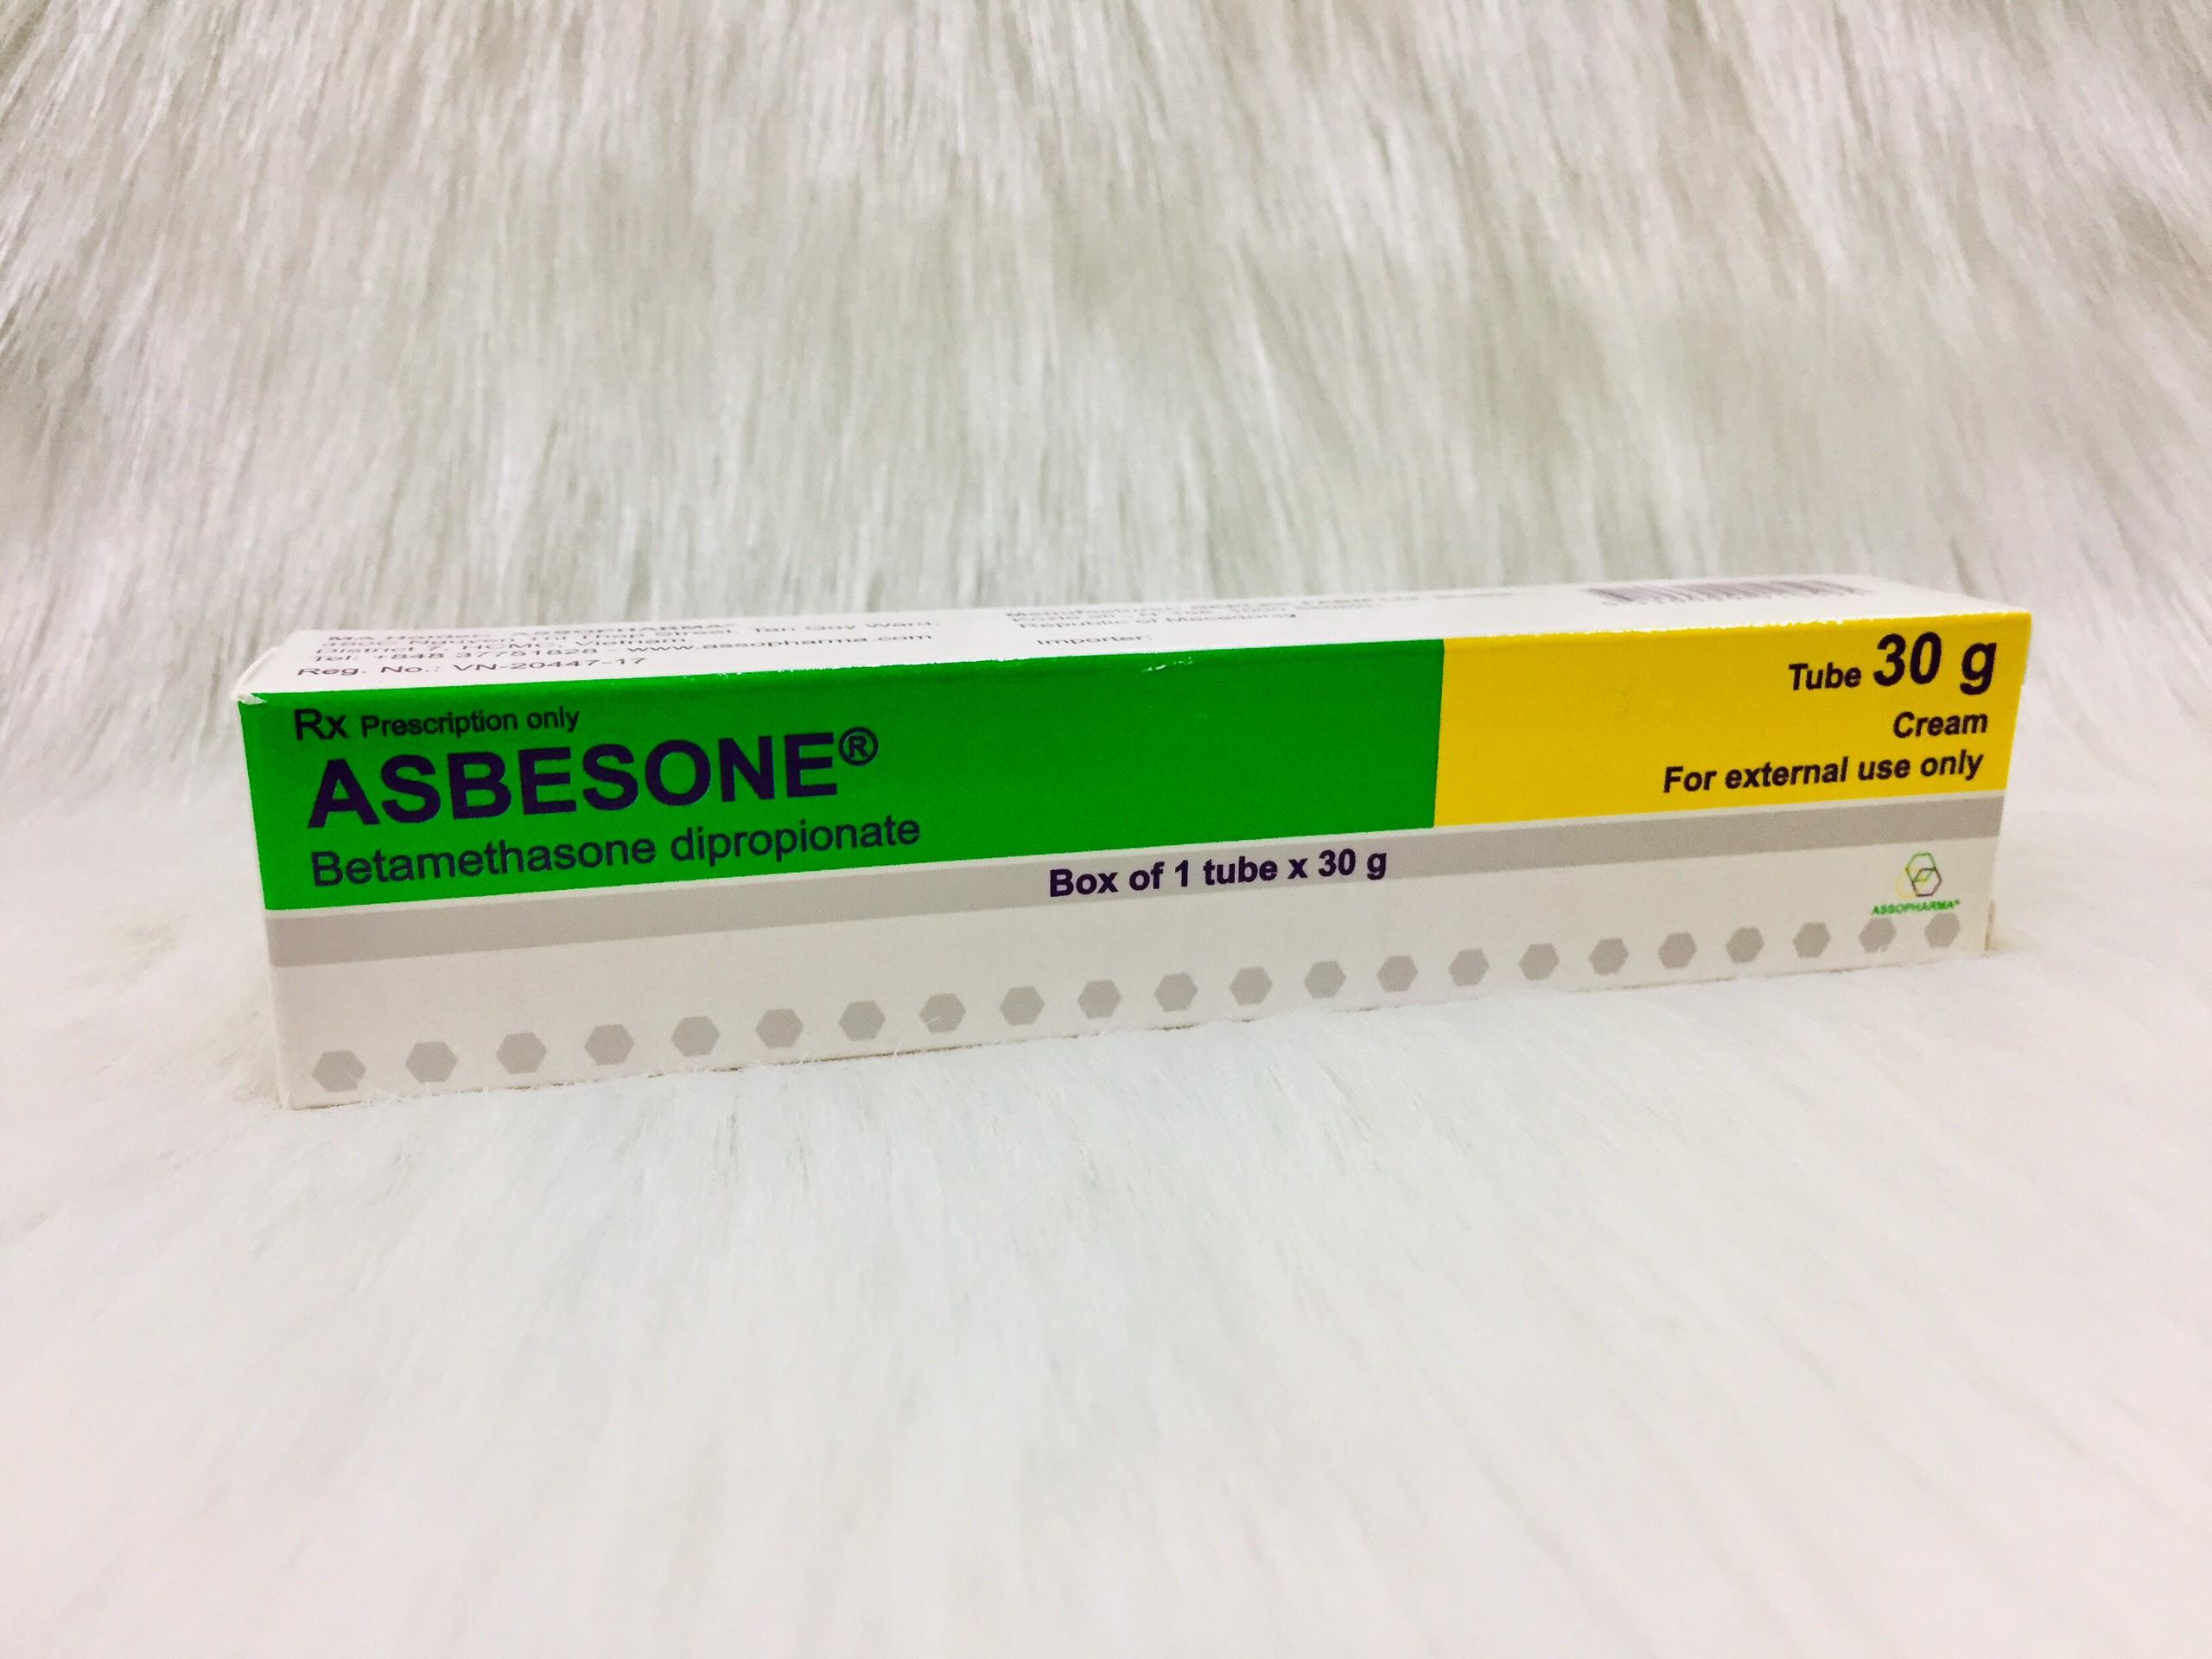 Asbesone cream 30g